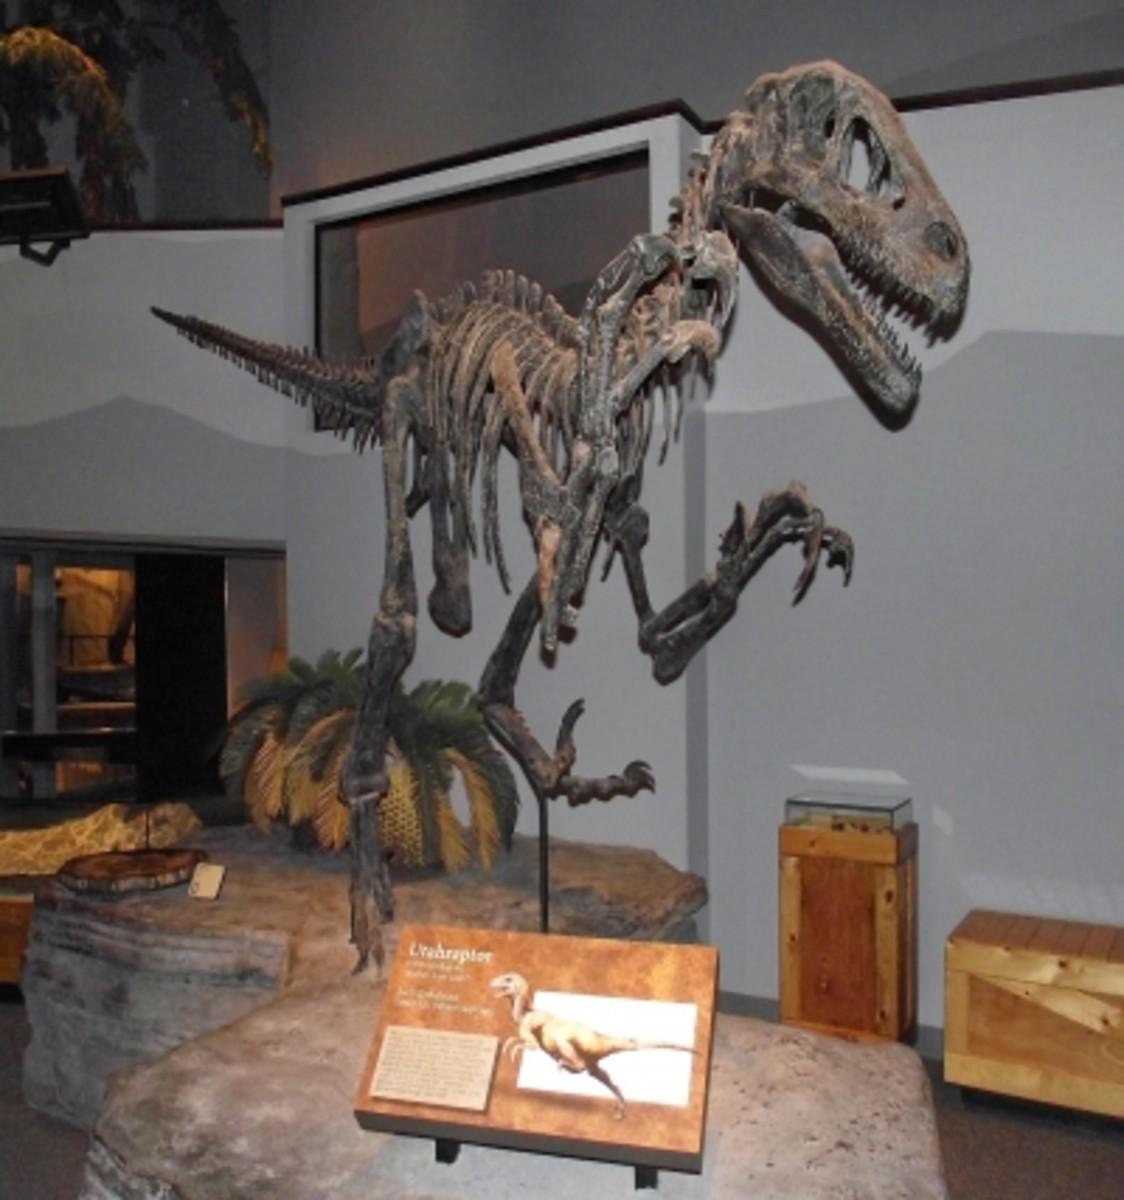 The Utahraptor is one scary looking dinosaur.